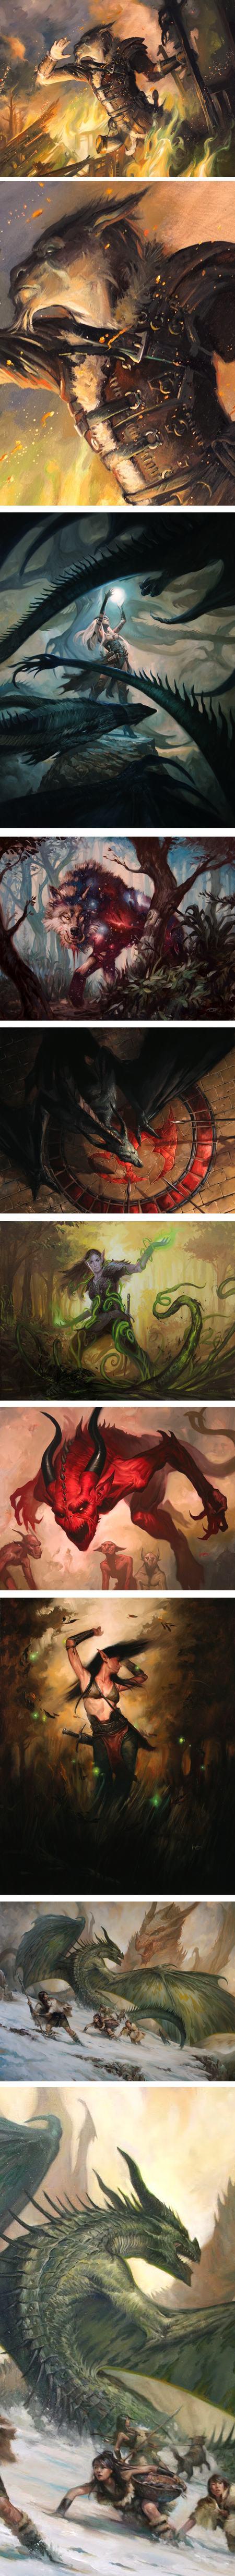 Lucas Graciano, fantasy illustration, dragons